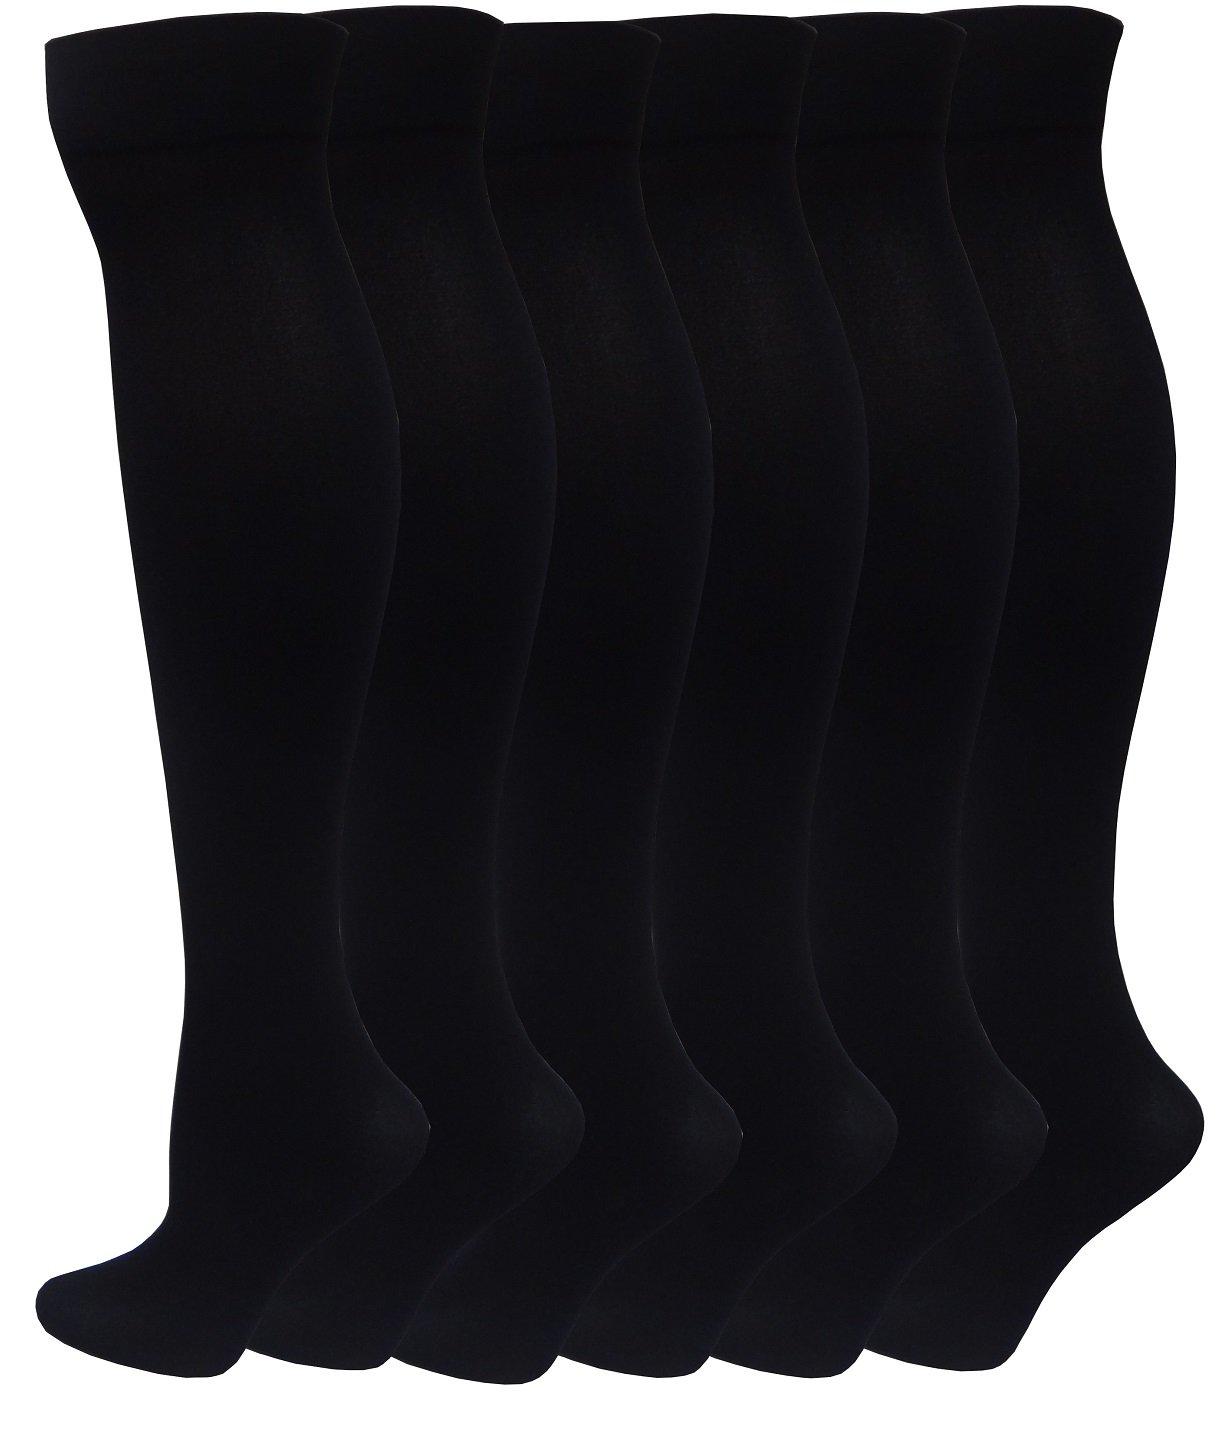 6 Pairs Women's Opaque Spandex Trouser Knee High Socks Queen Size 10-13 (Black)